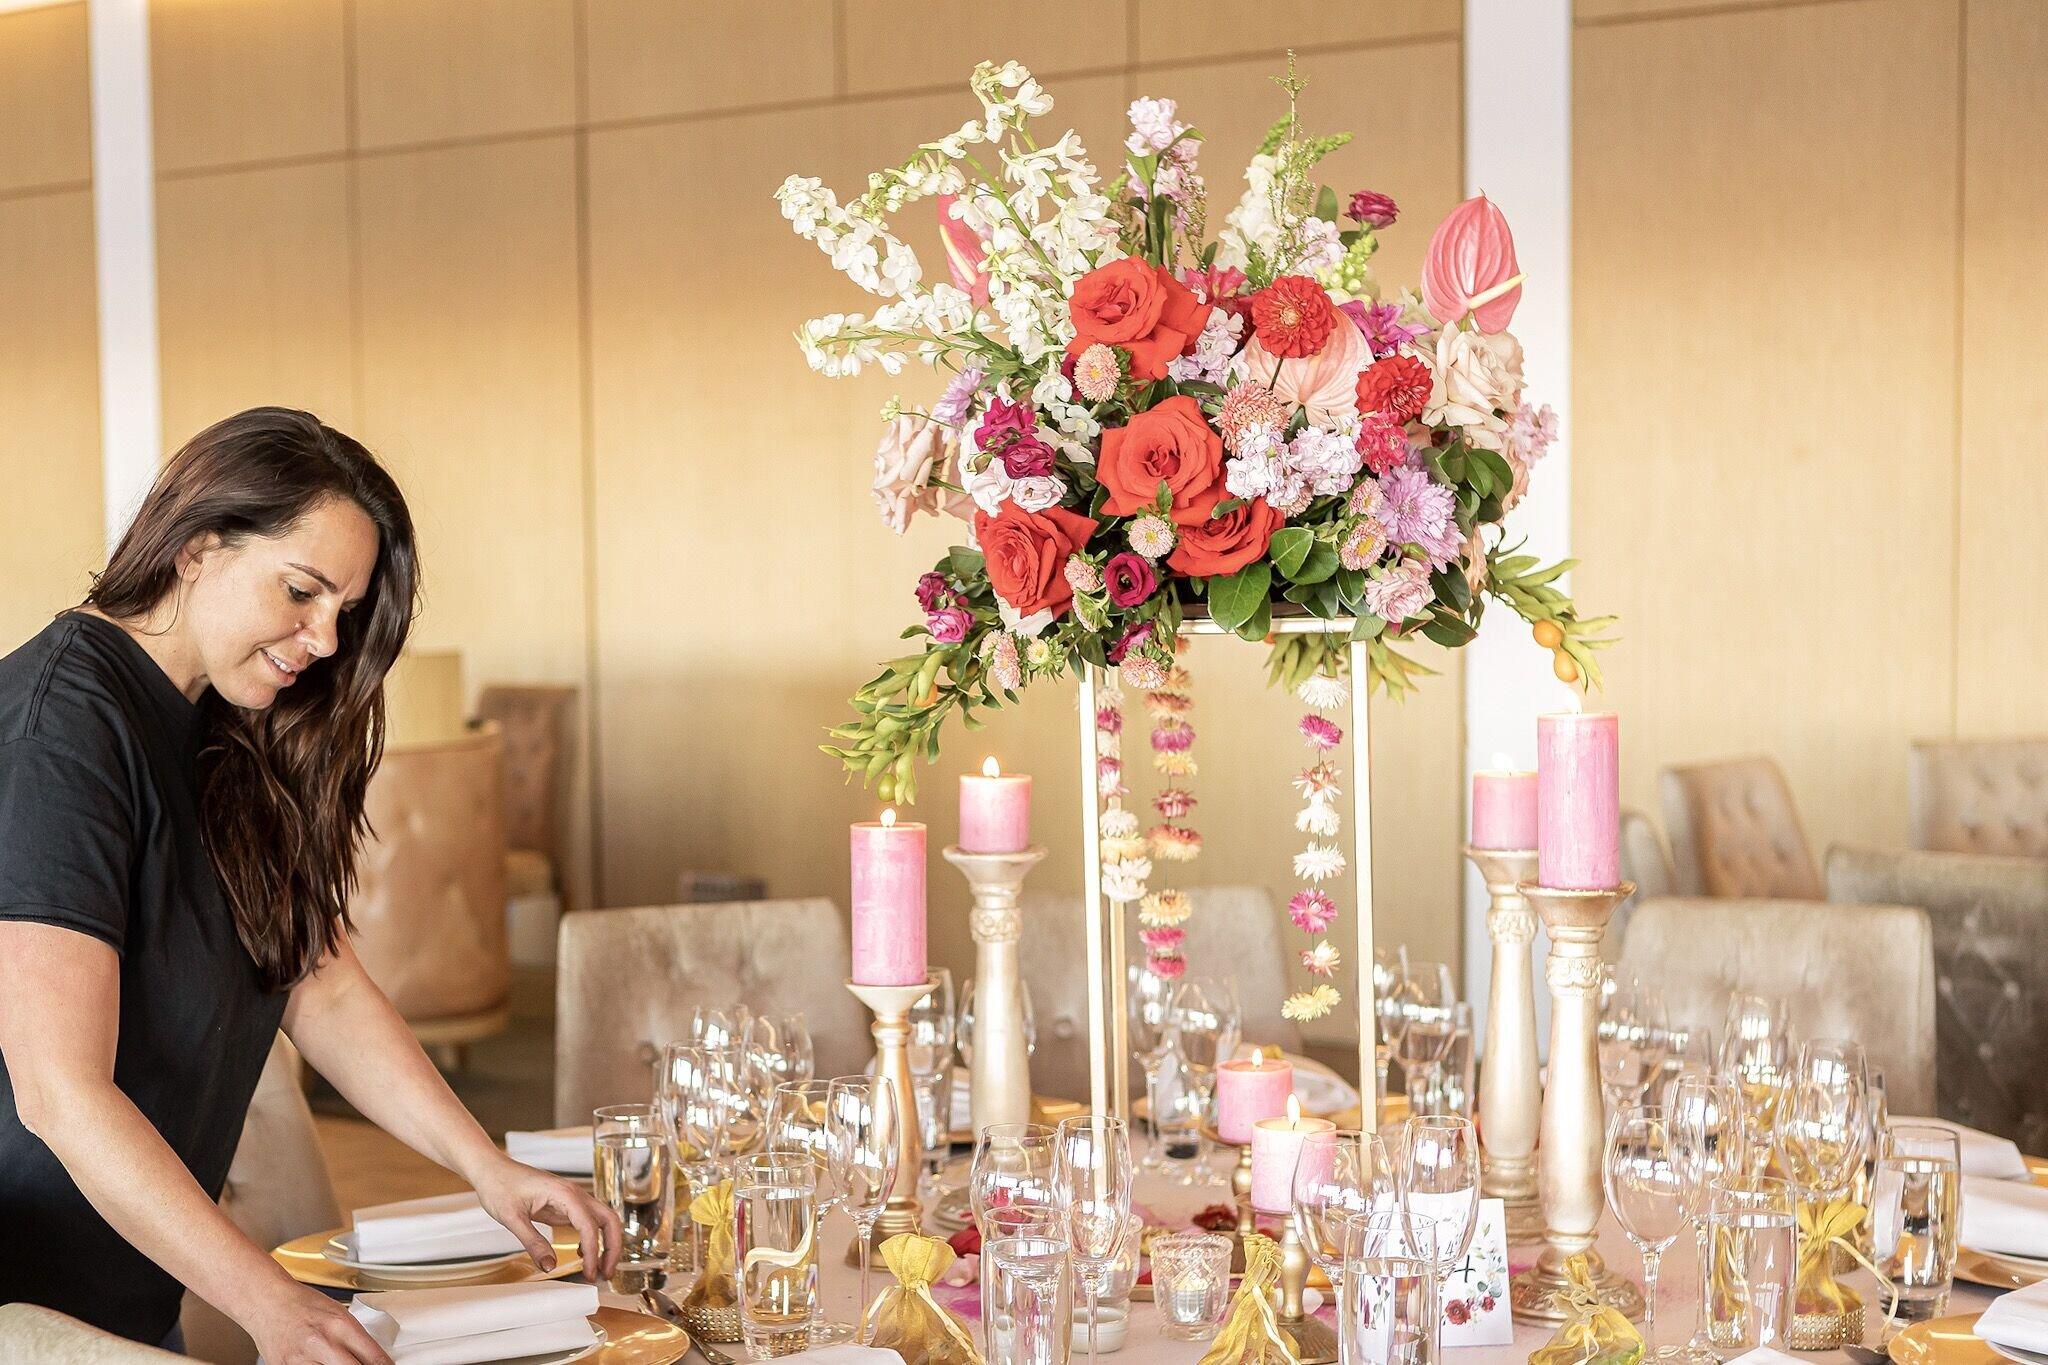 Chanele Rose flowers Sydney wedding stylist